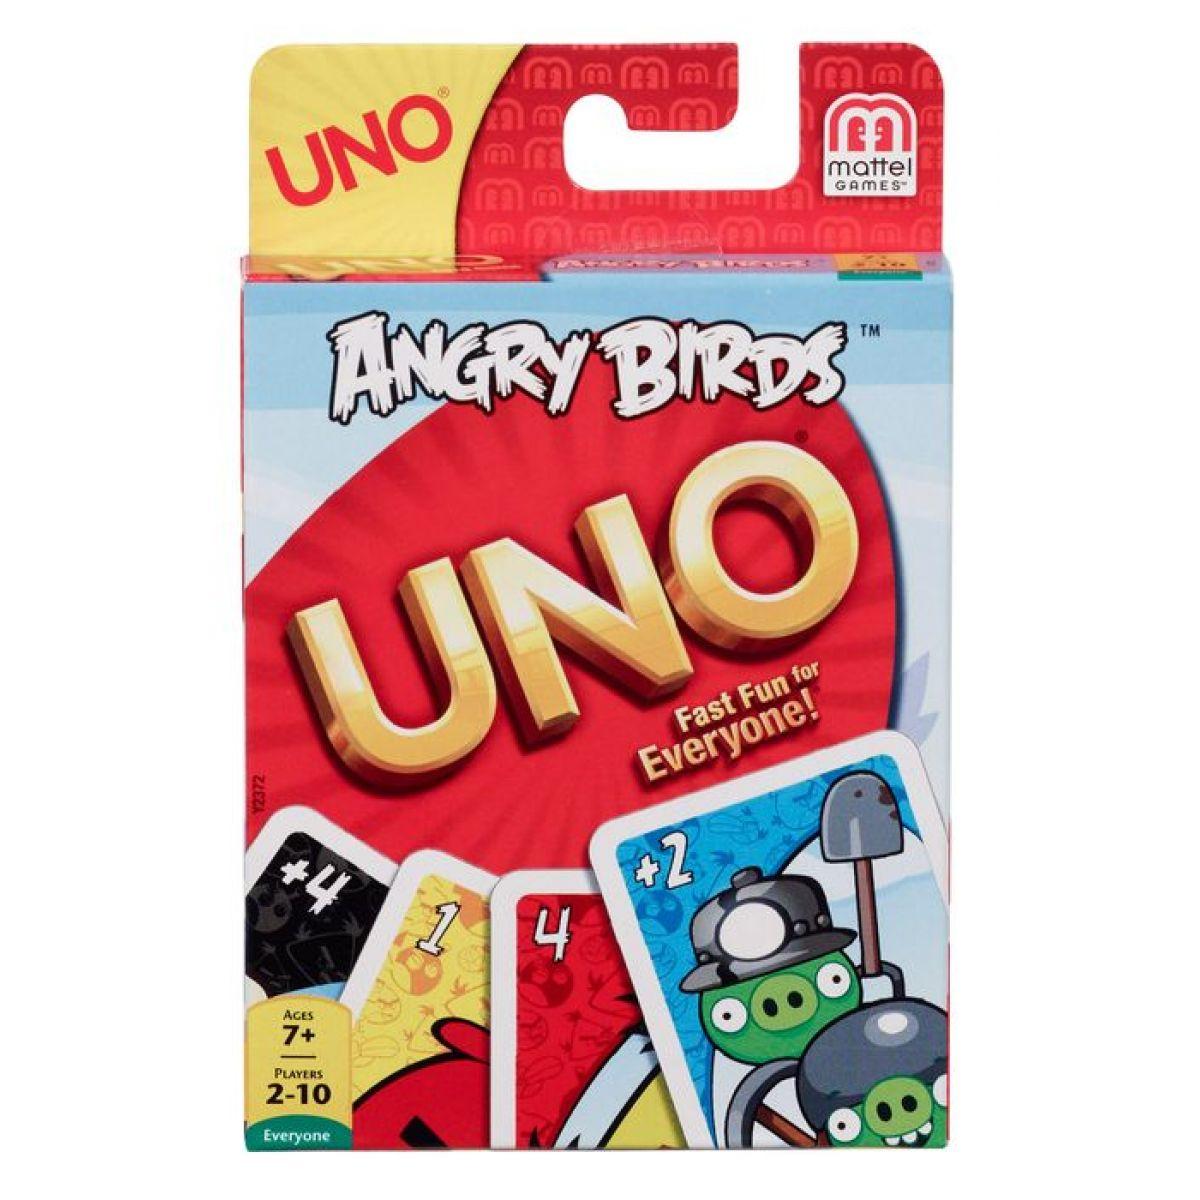 UNO karty Angry birds Mattel Y2372